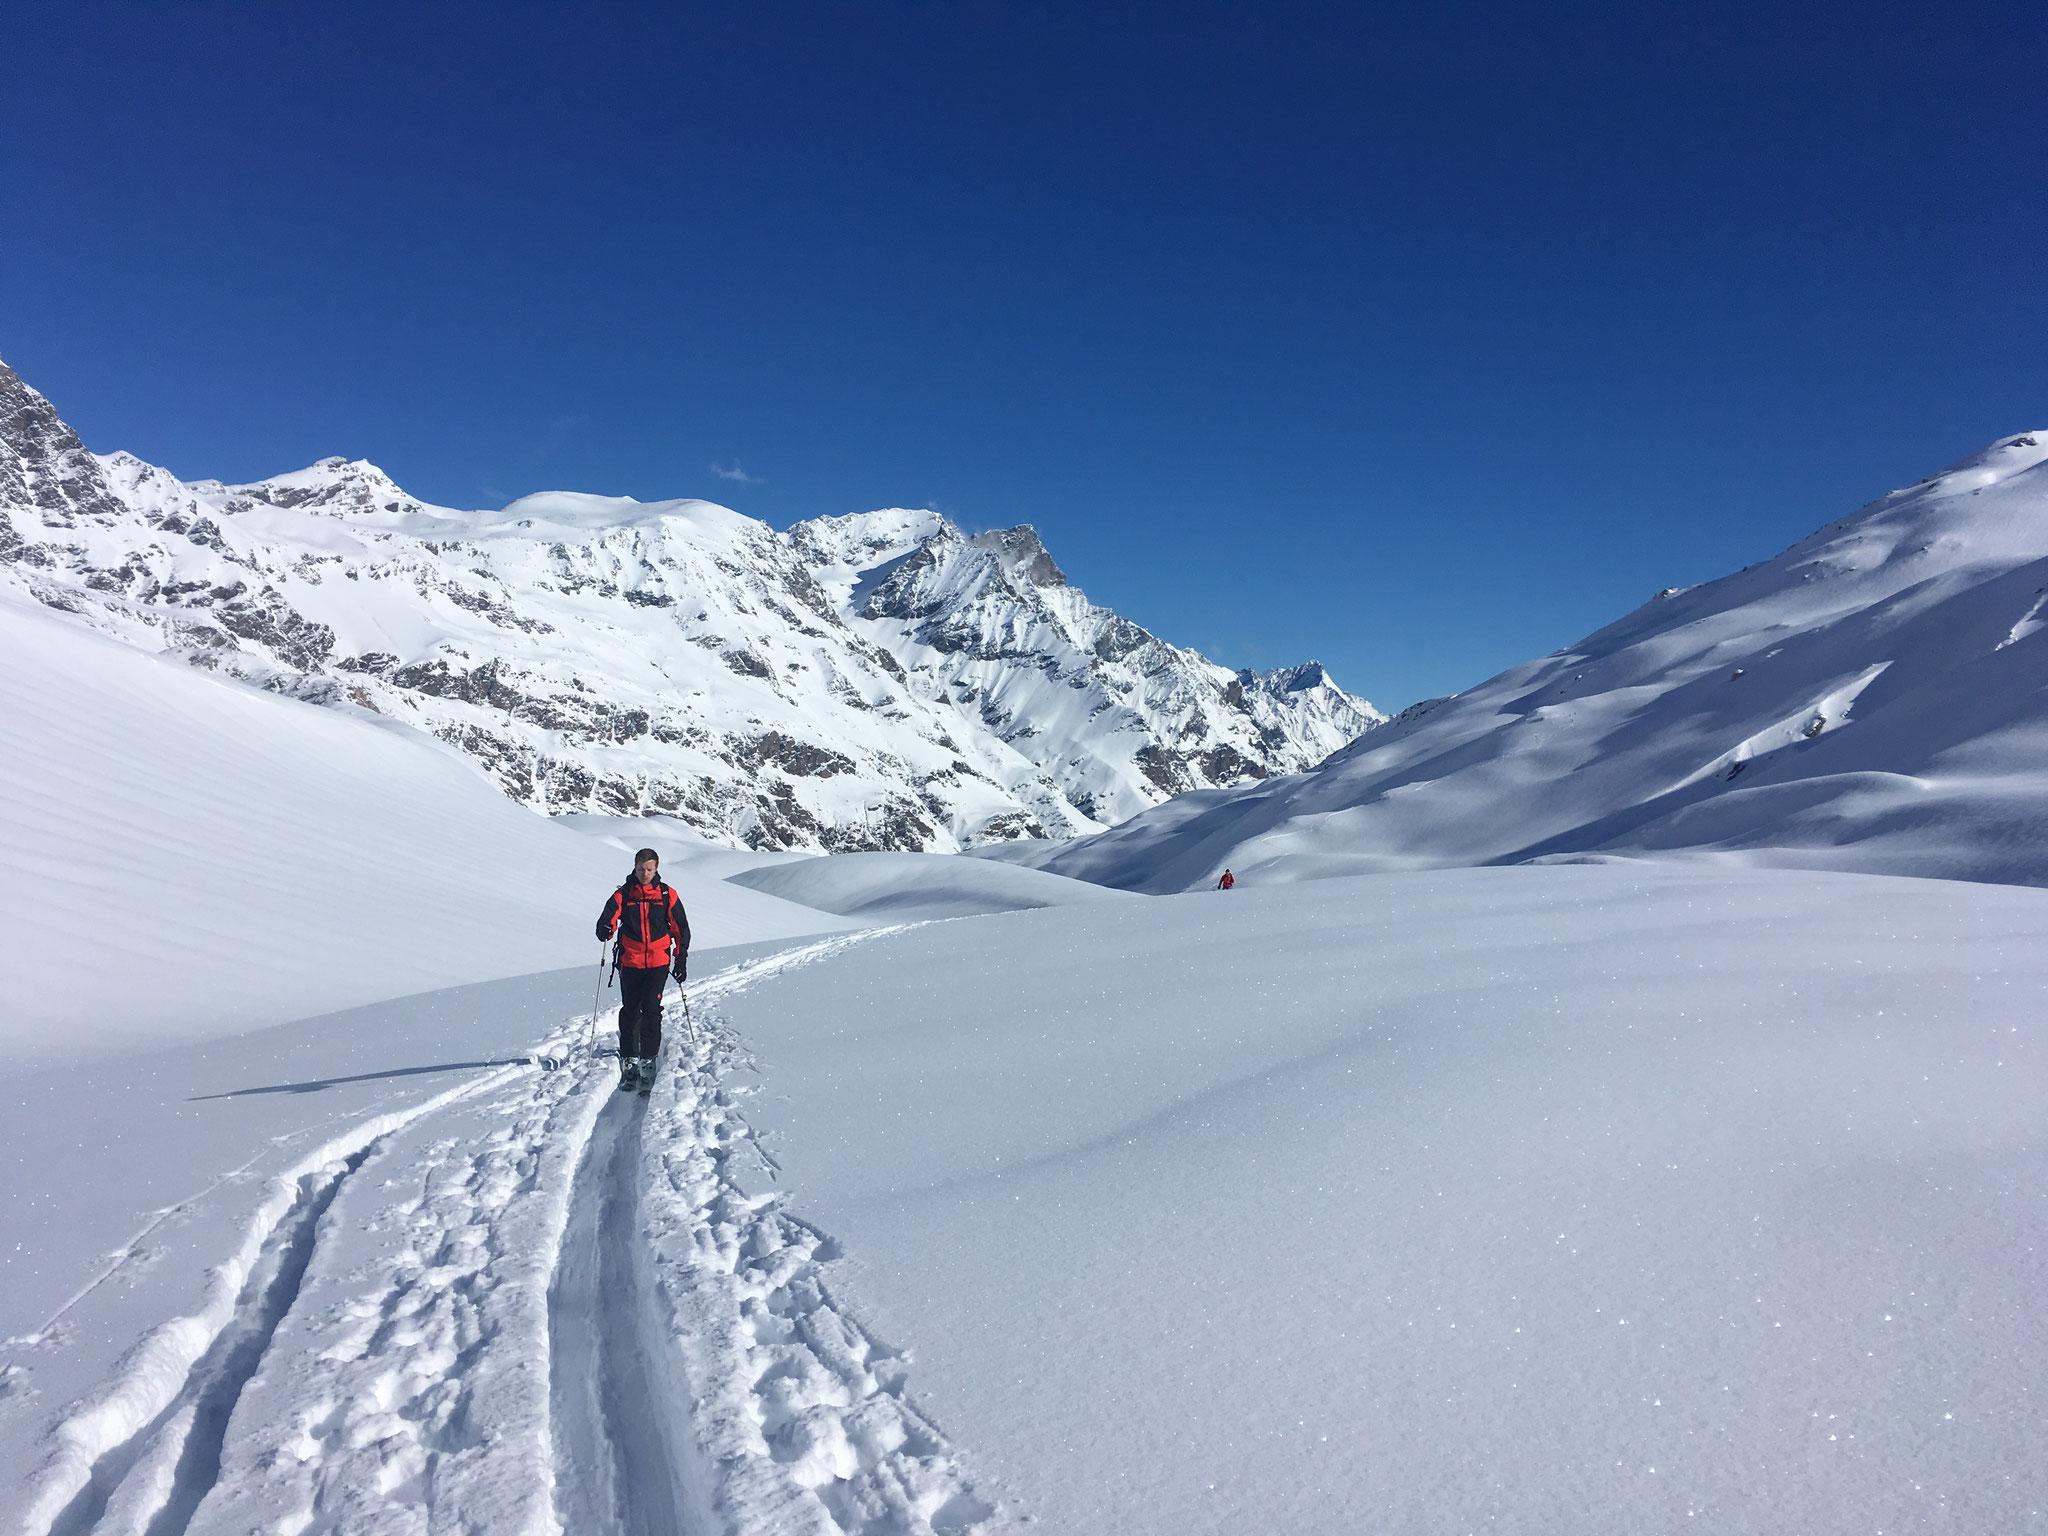 Edouard en ballade sur le Haut Val di Rhèmes. Quel décor !